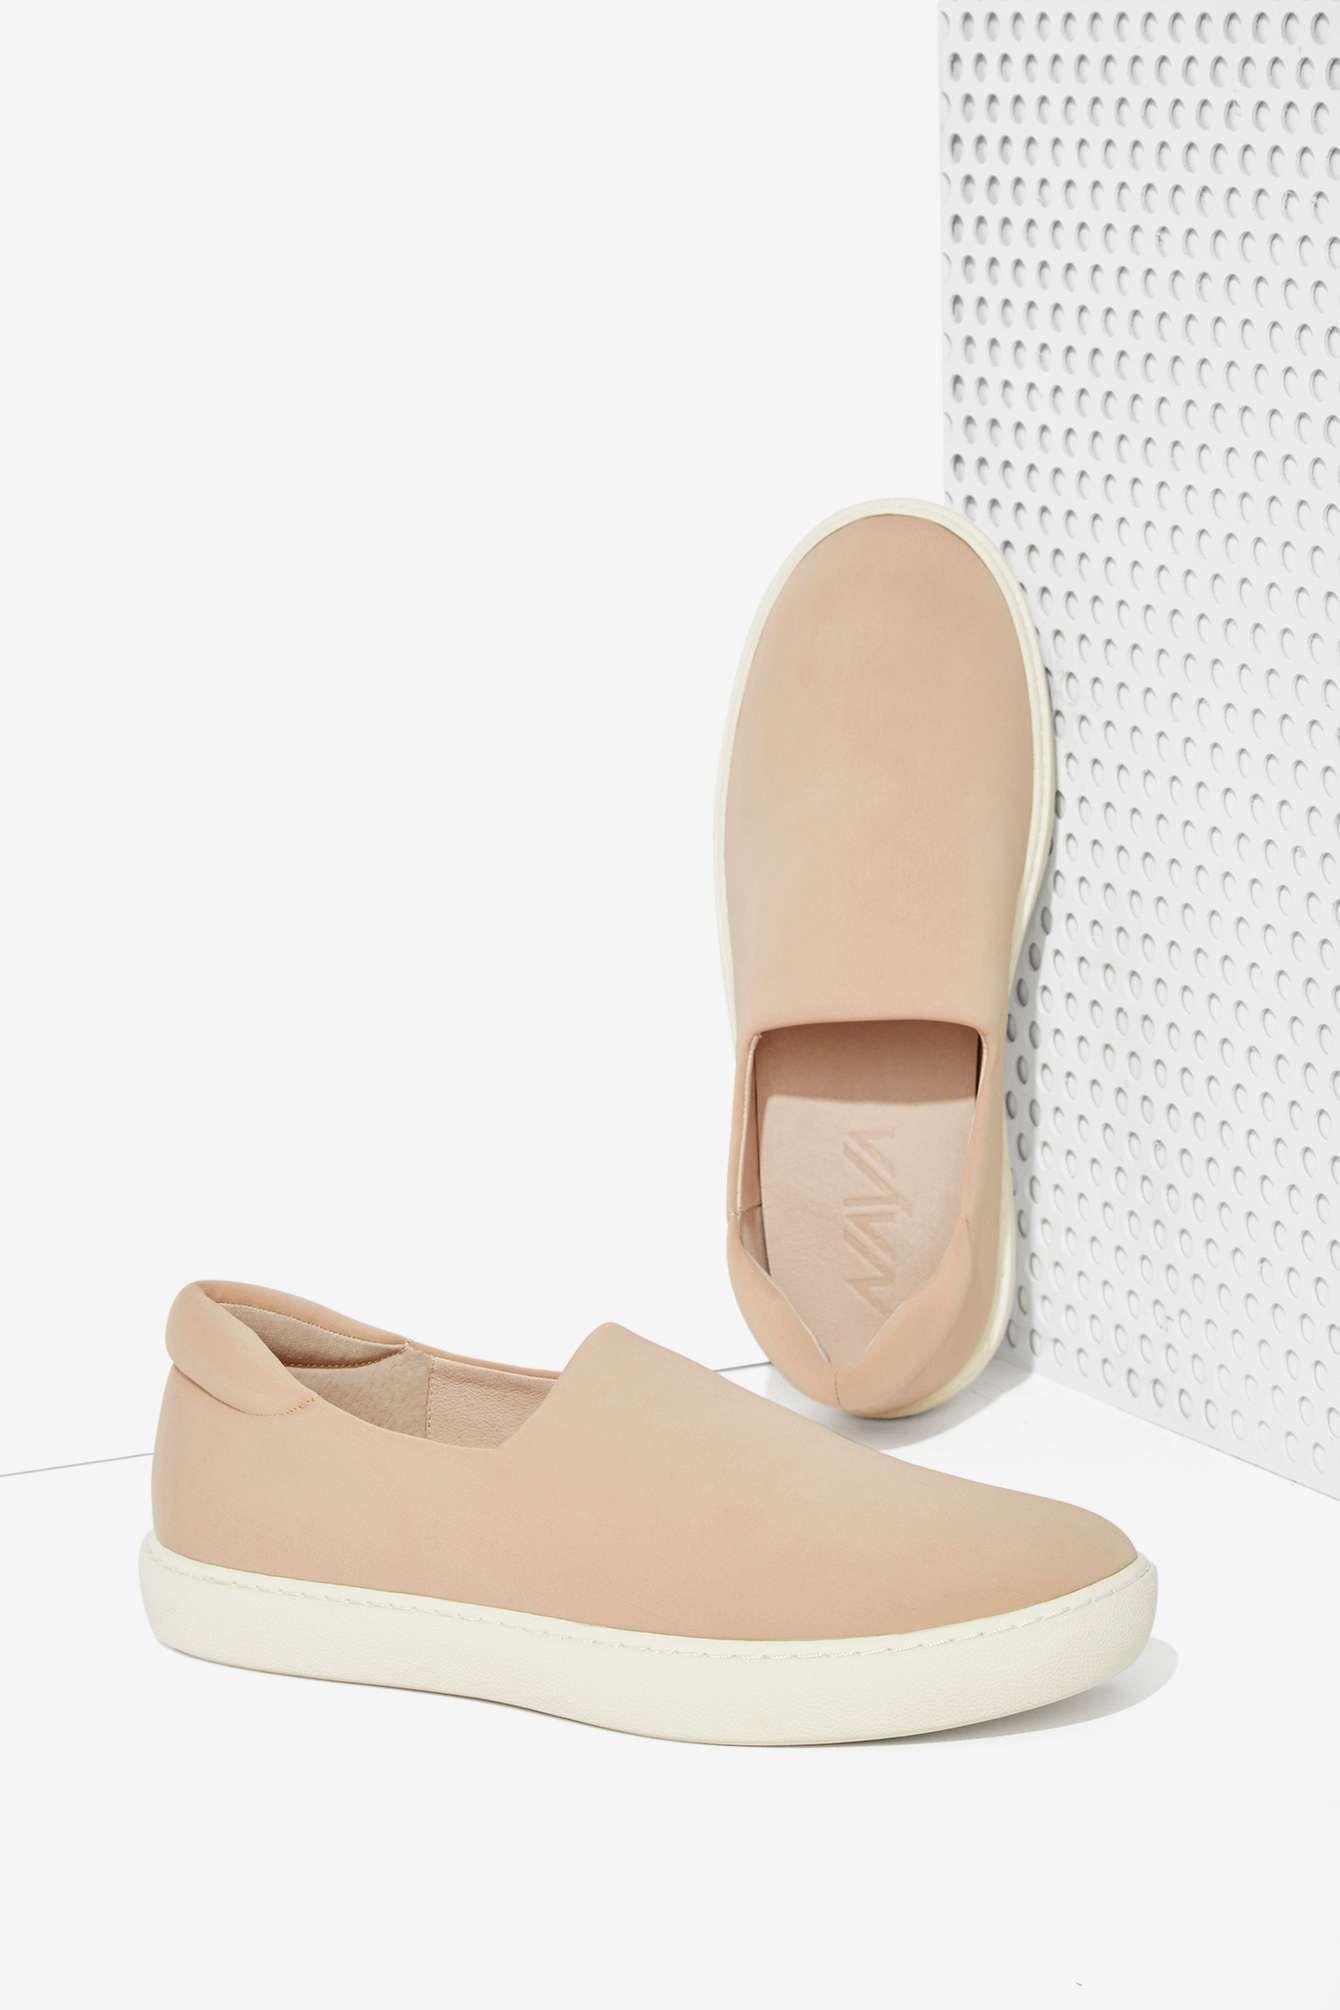 2031ce542668 Naya Juno Neoprene Slip-On Sneaker - Nude